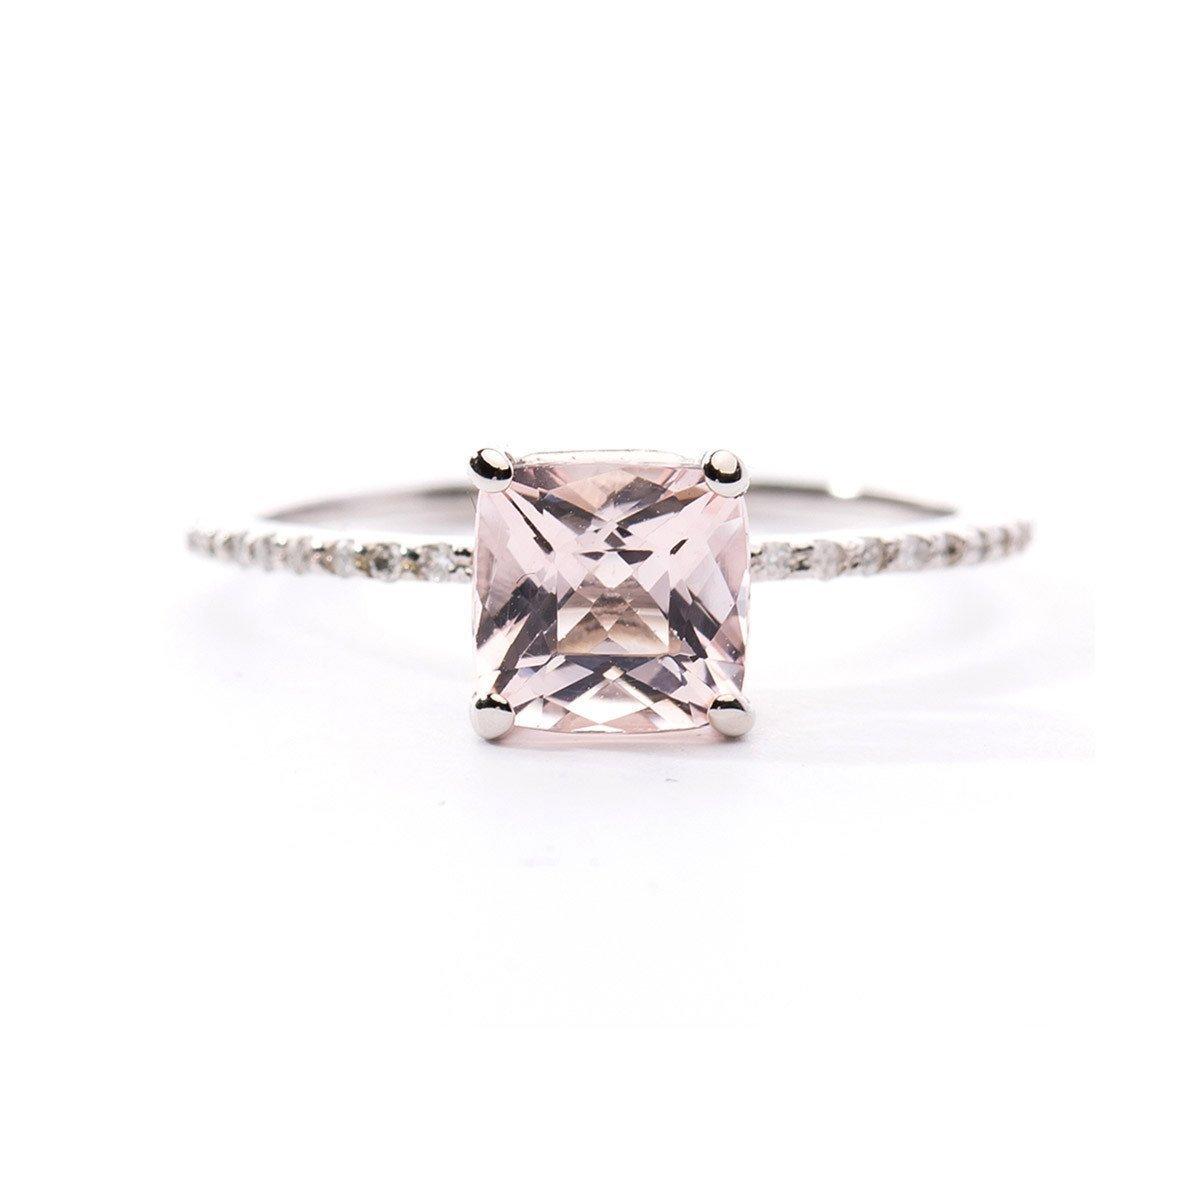 Princess Cut Morganite Ring - Oh my Christine Jewelry